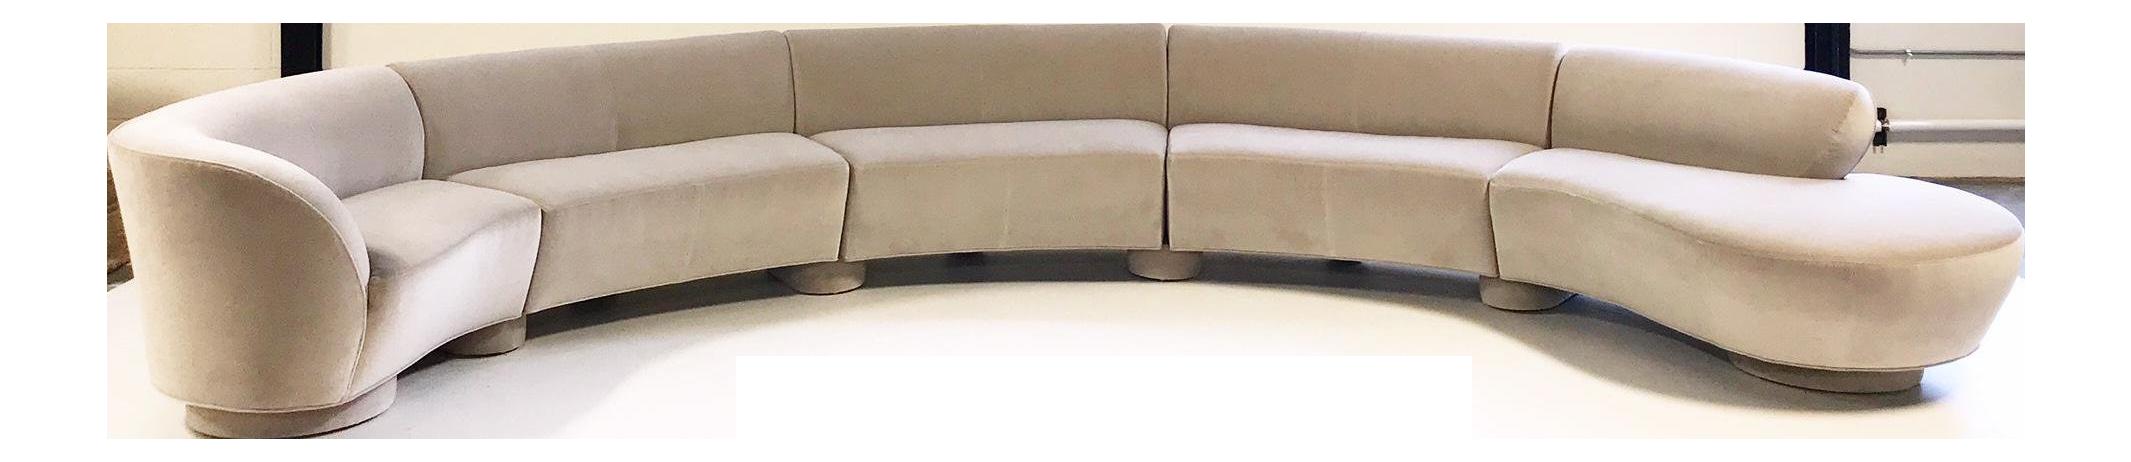 Vintage Vladimir Kagan 5 Piece Cloud Sectional Sofa Restored In Loro Piana  Grey Velvet For